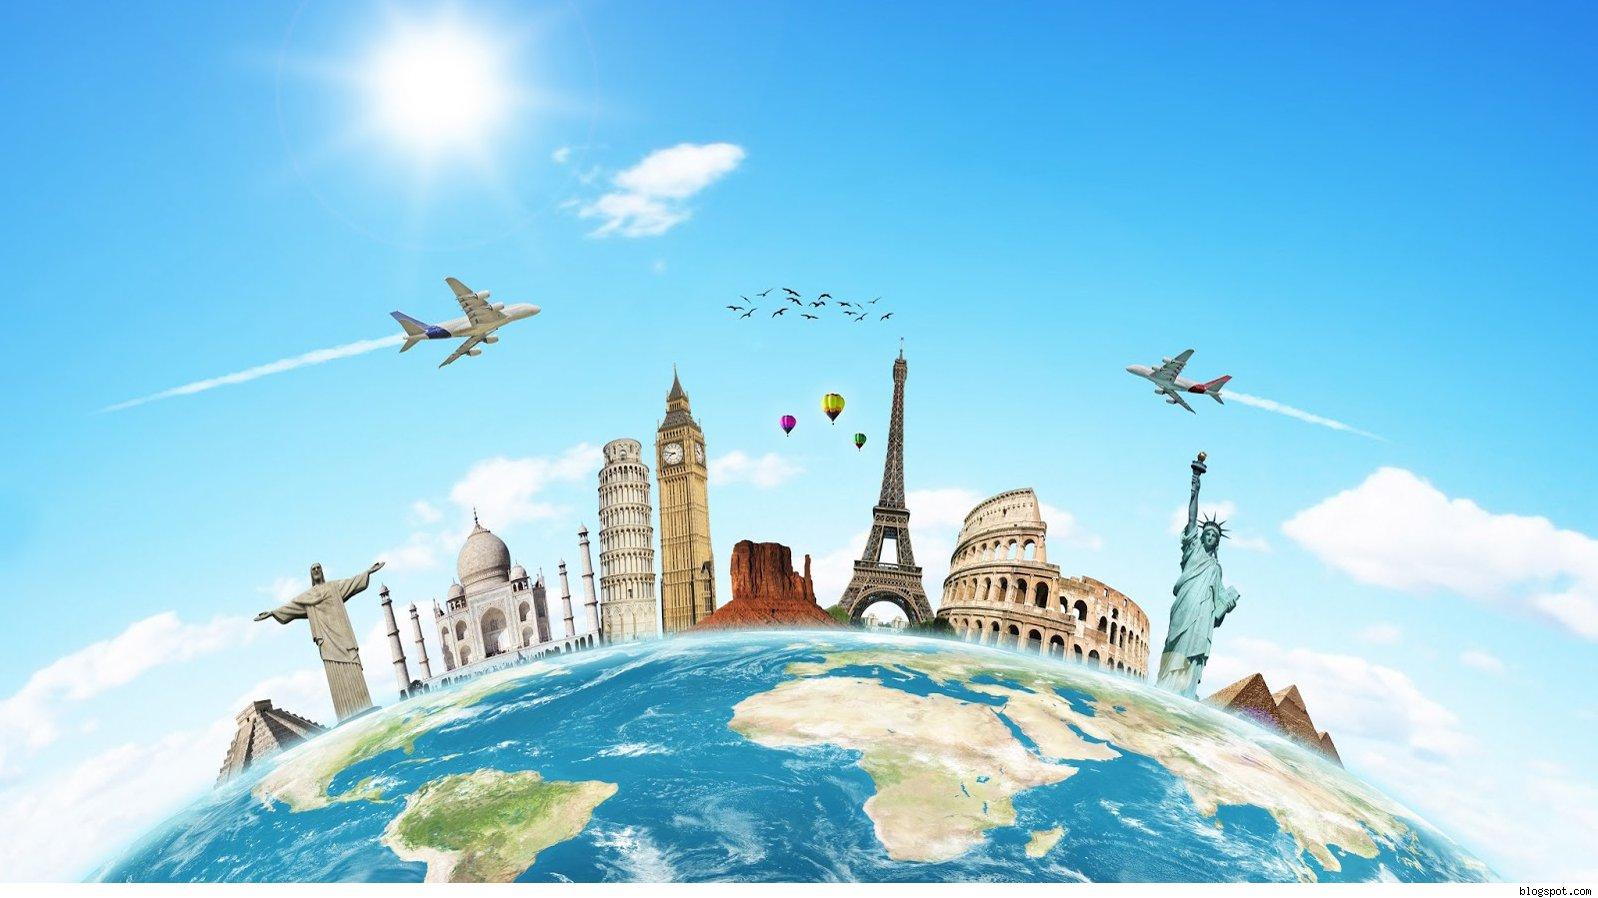 Travelling around the world